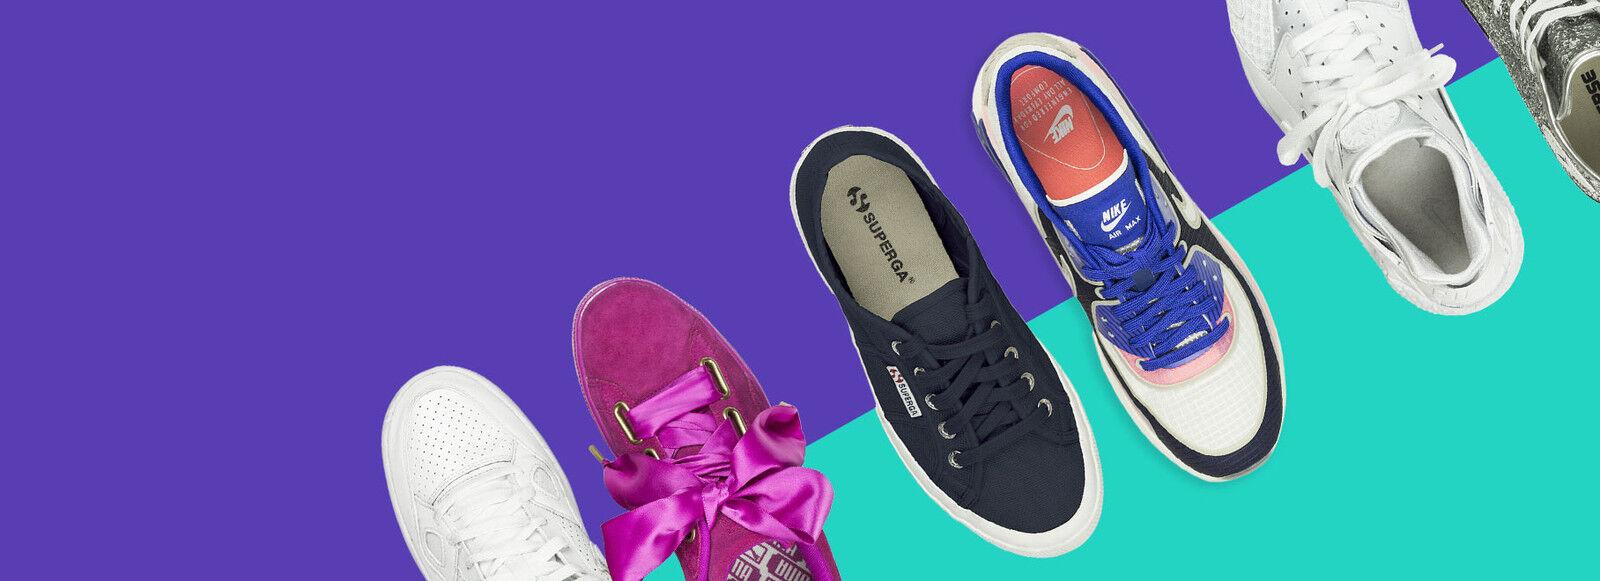 Verlängert! -20%* auf Sneaker